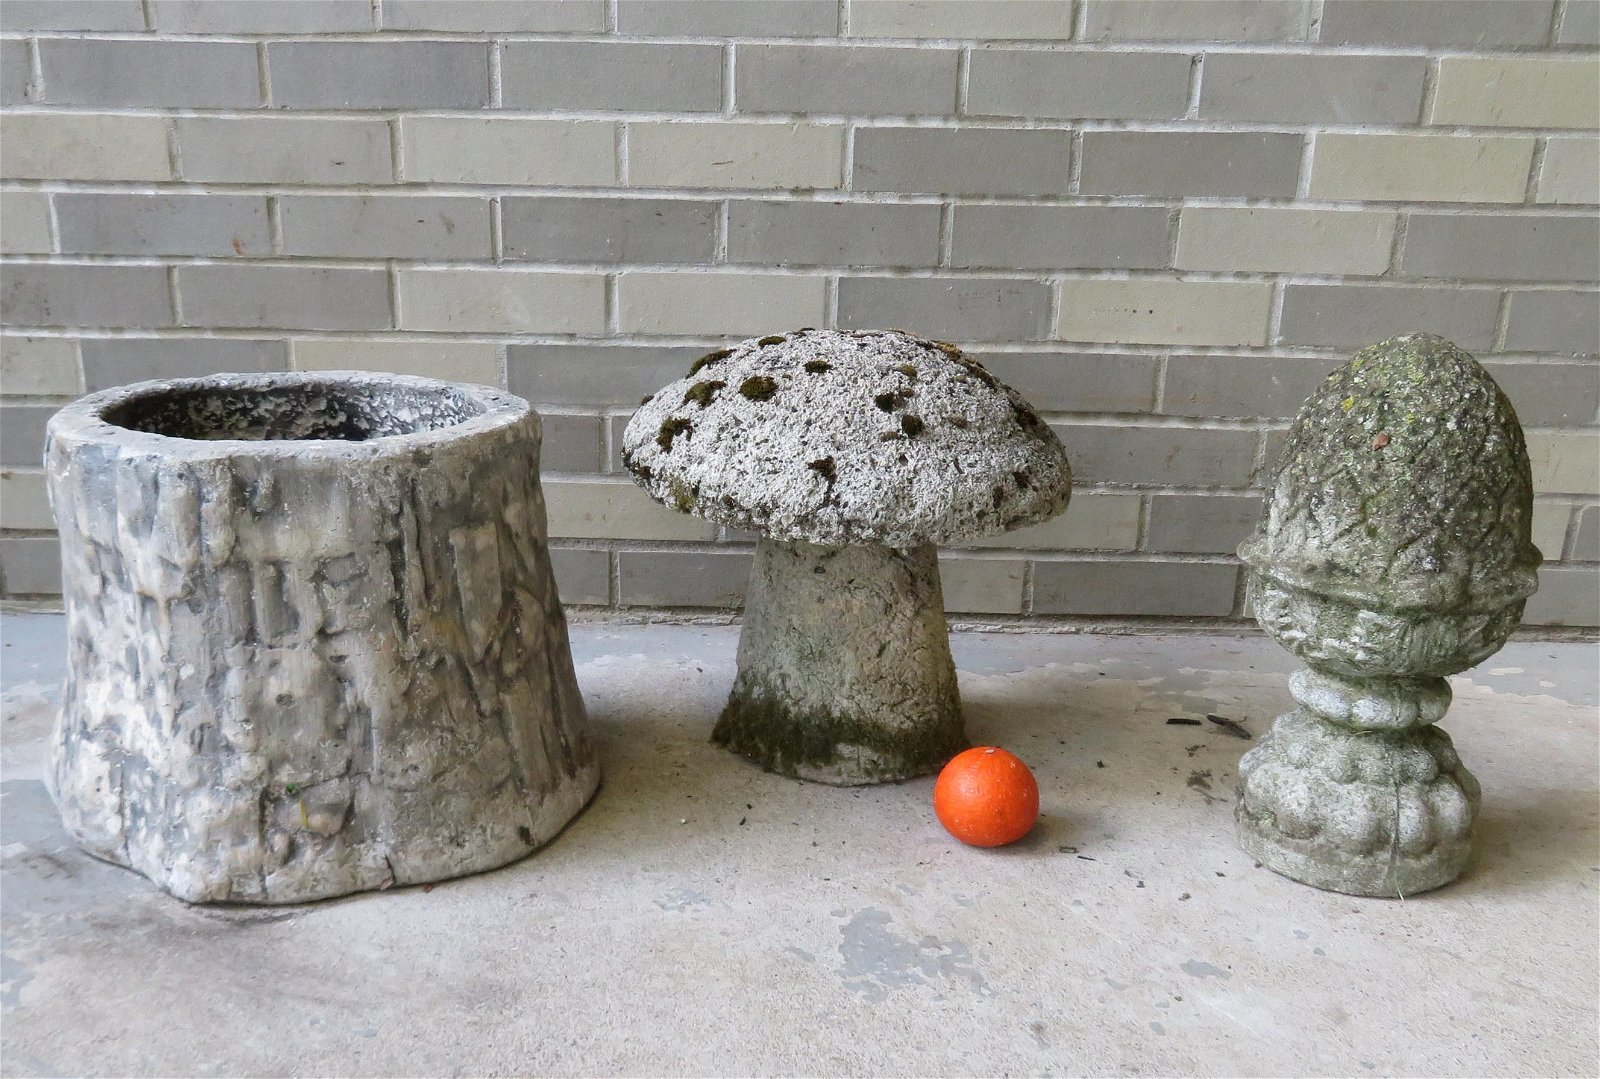 Grouping of 3 decorative garden items: 1) A concrete